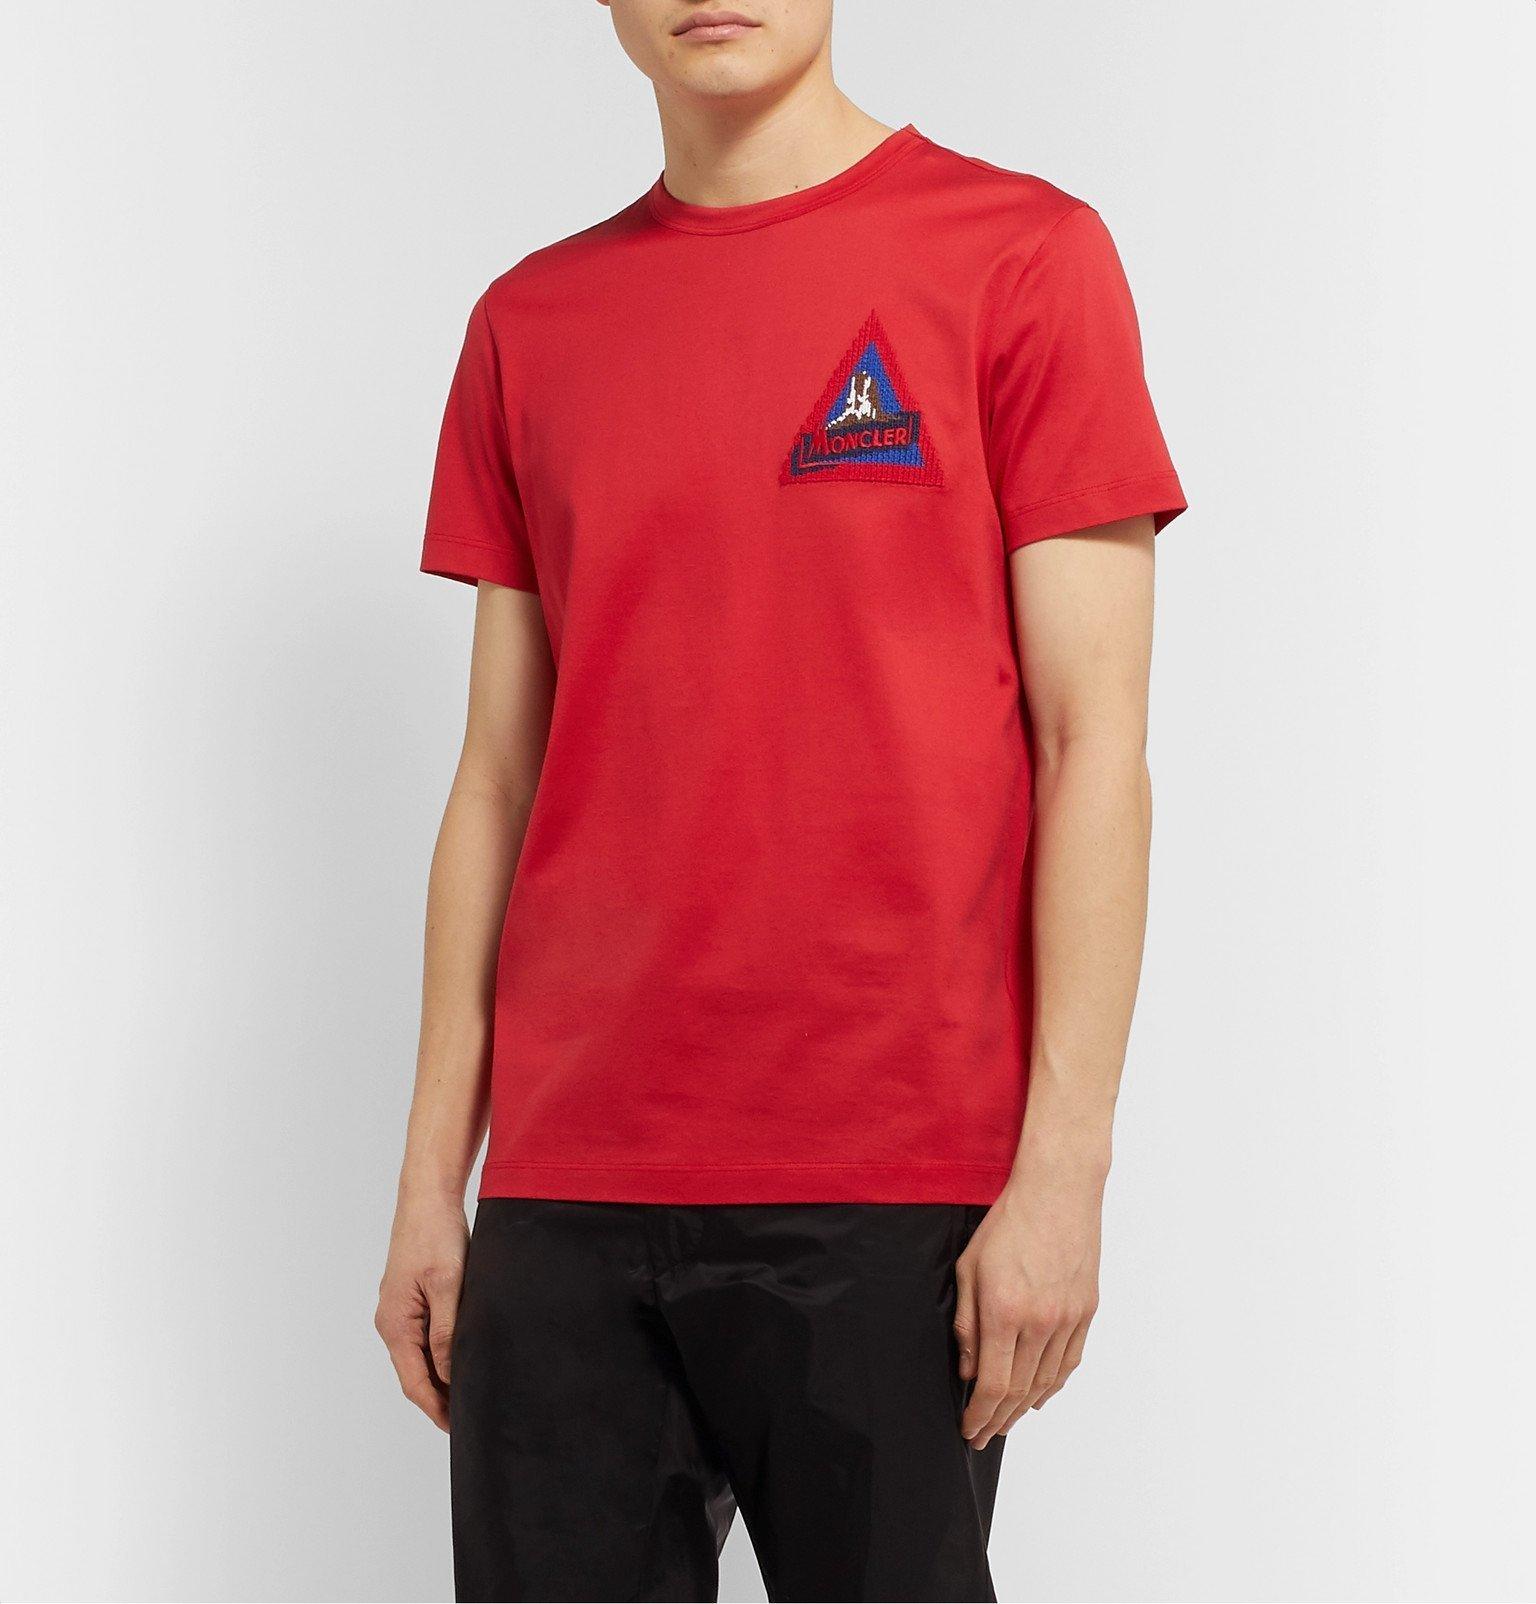 Moncler - Logo-Appliquéd Cotton-Jersey T-Shirt - Red